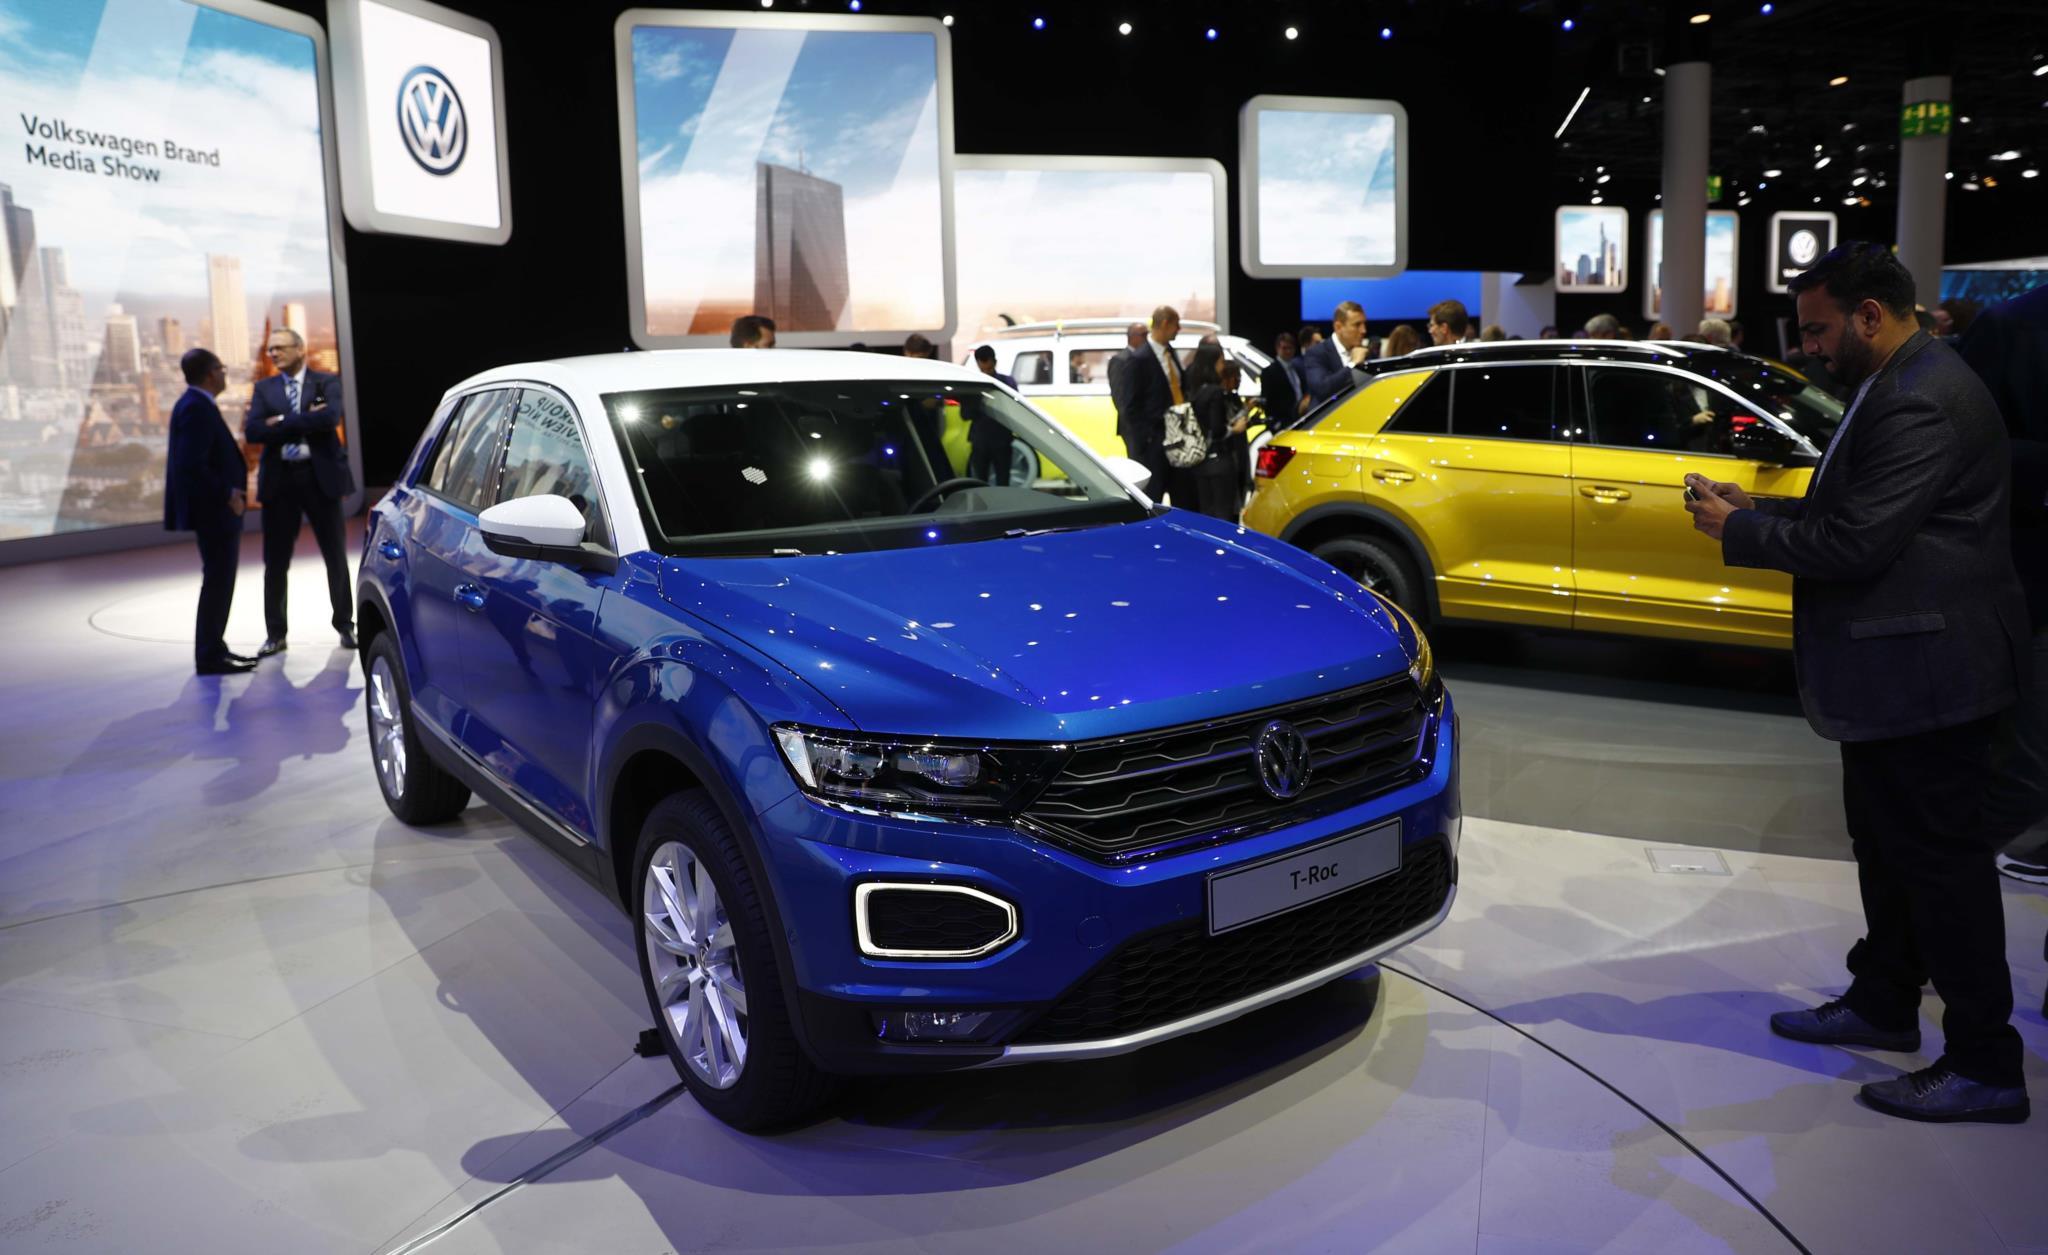 VW T-Roc, que será produzido na Autoeuropa